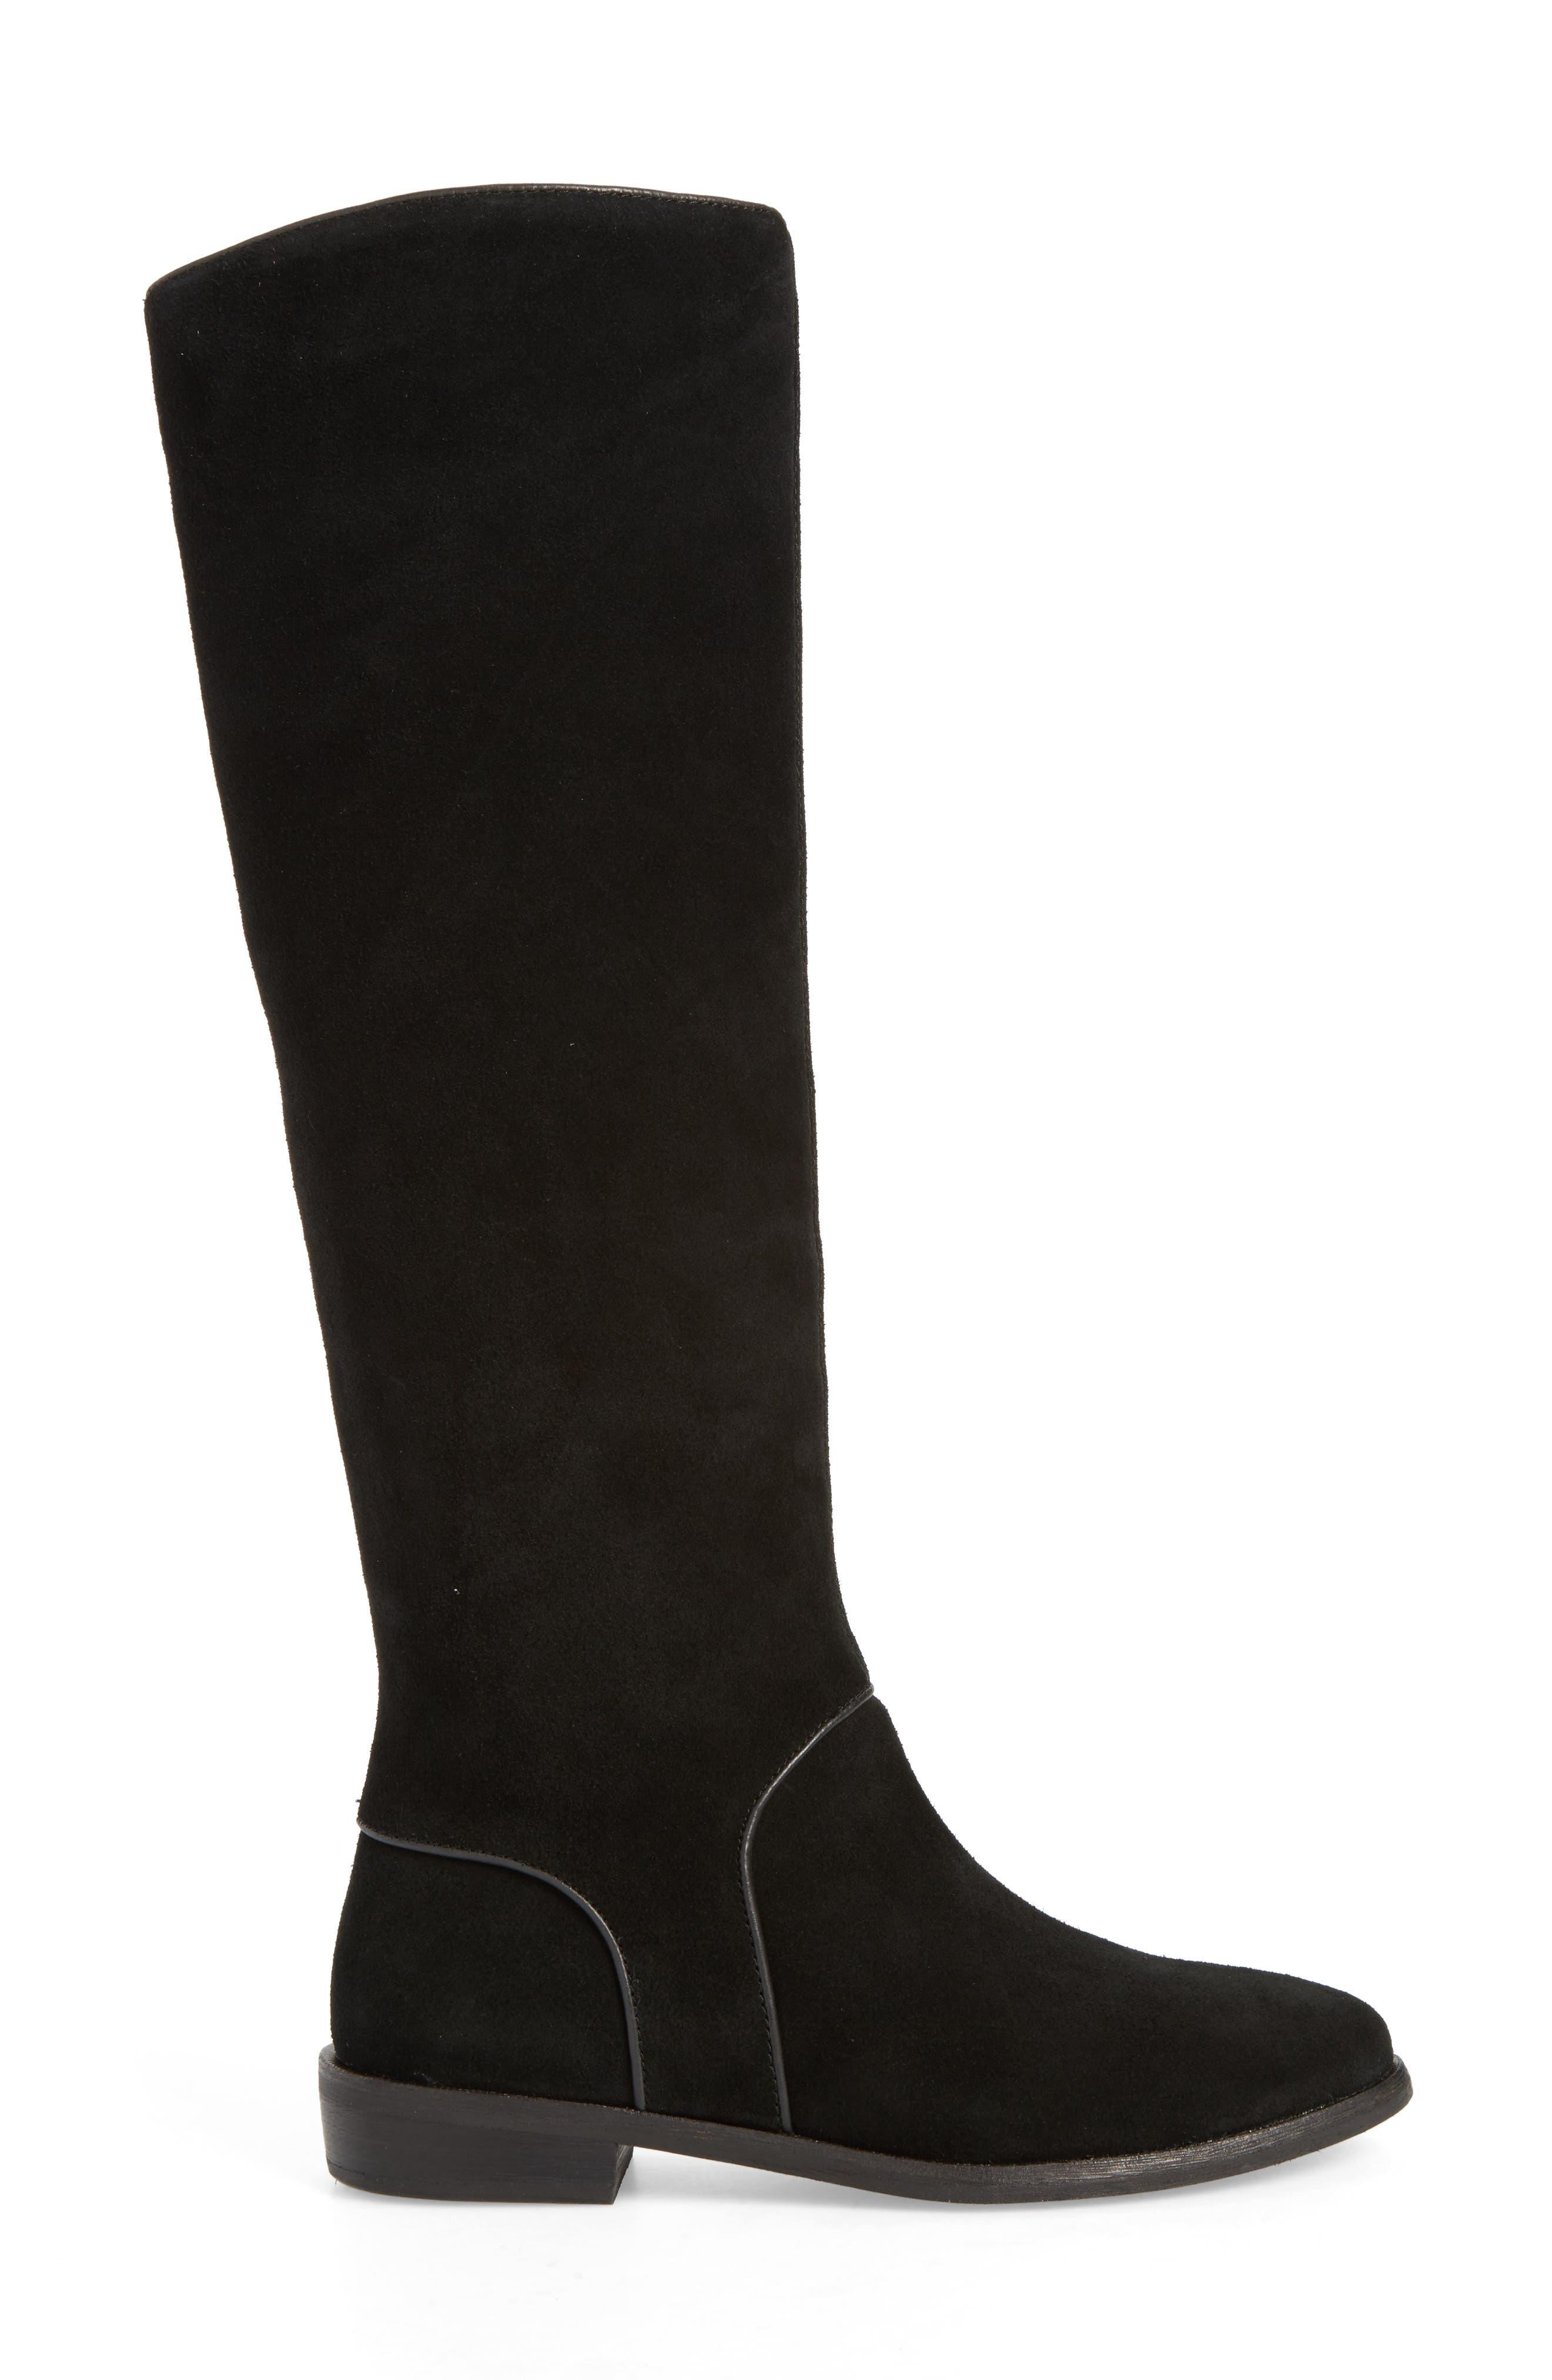 Gracen Knee High Boot,                             Alternate thumbnail 3, color,                             Black Suede